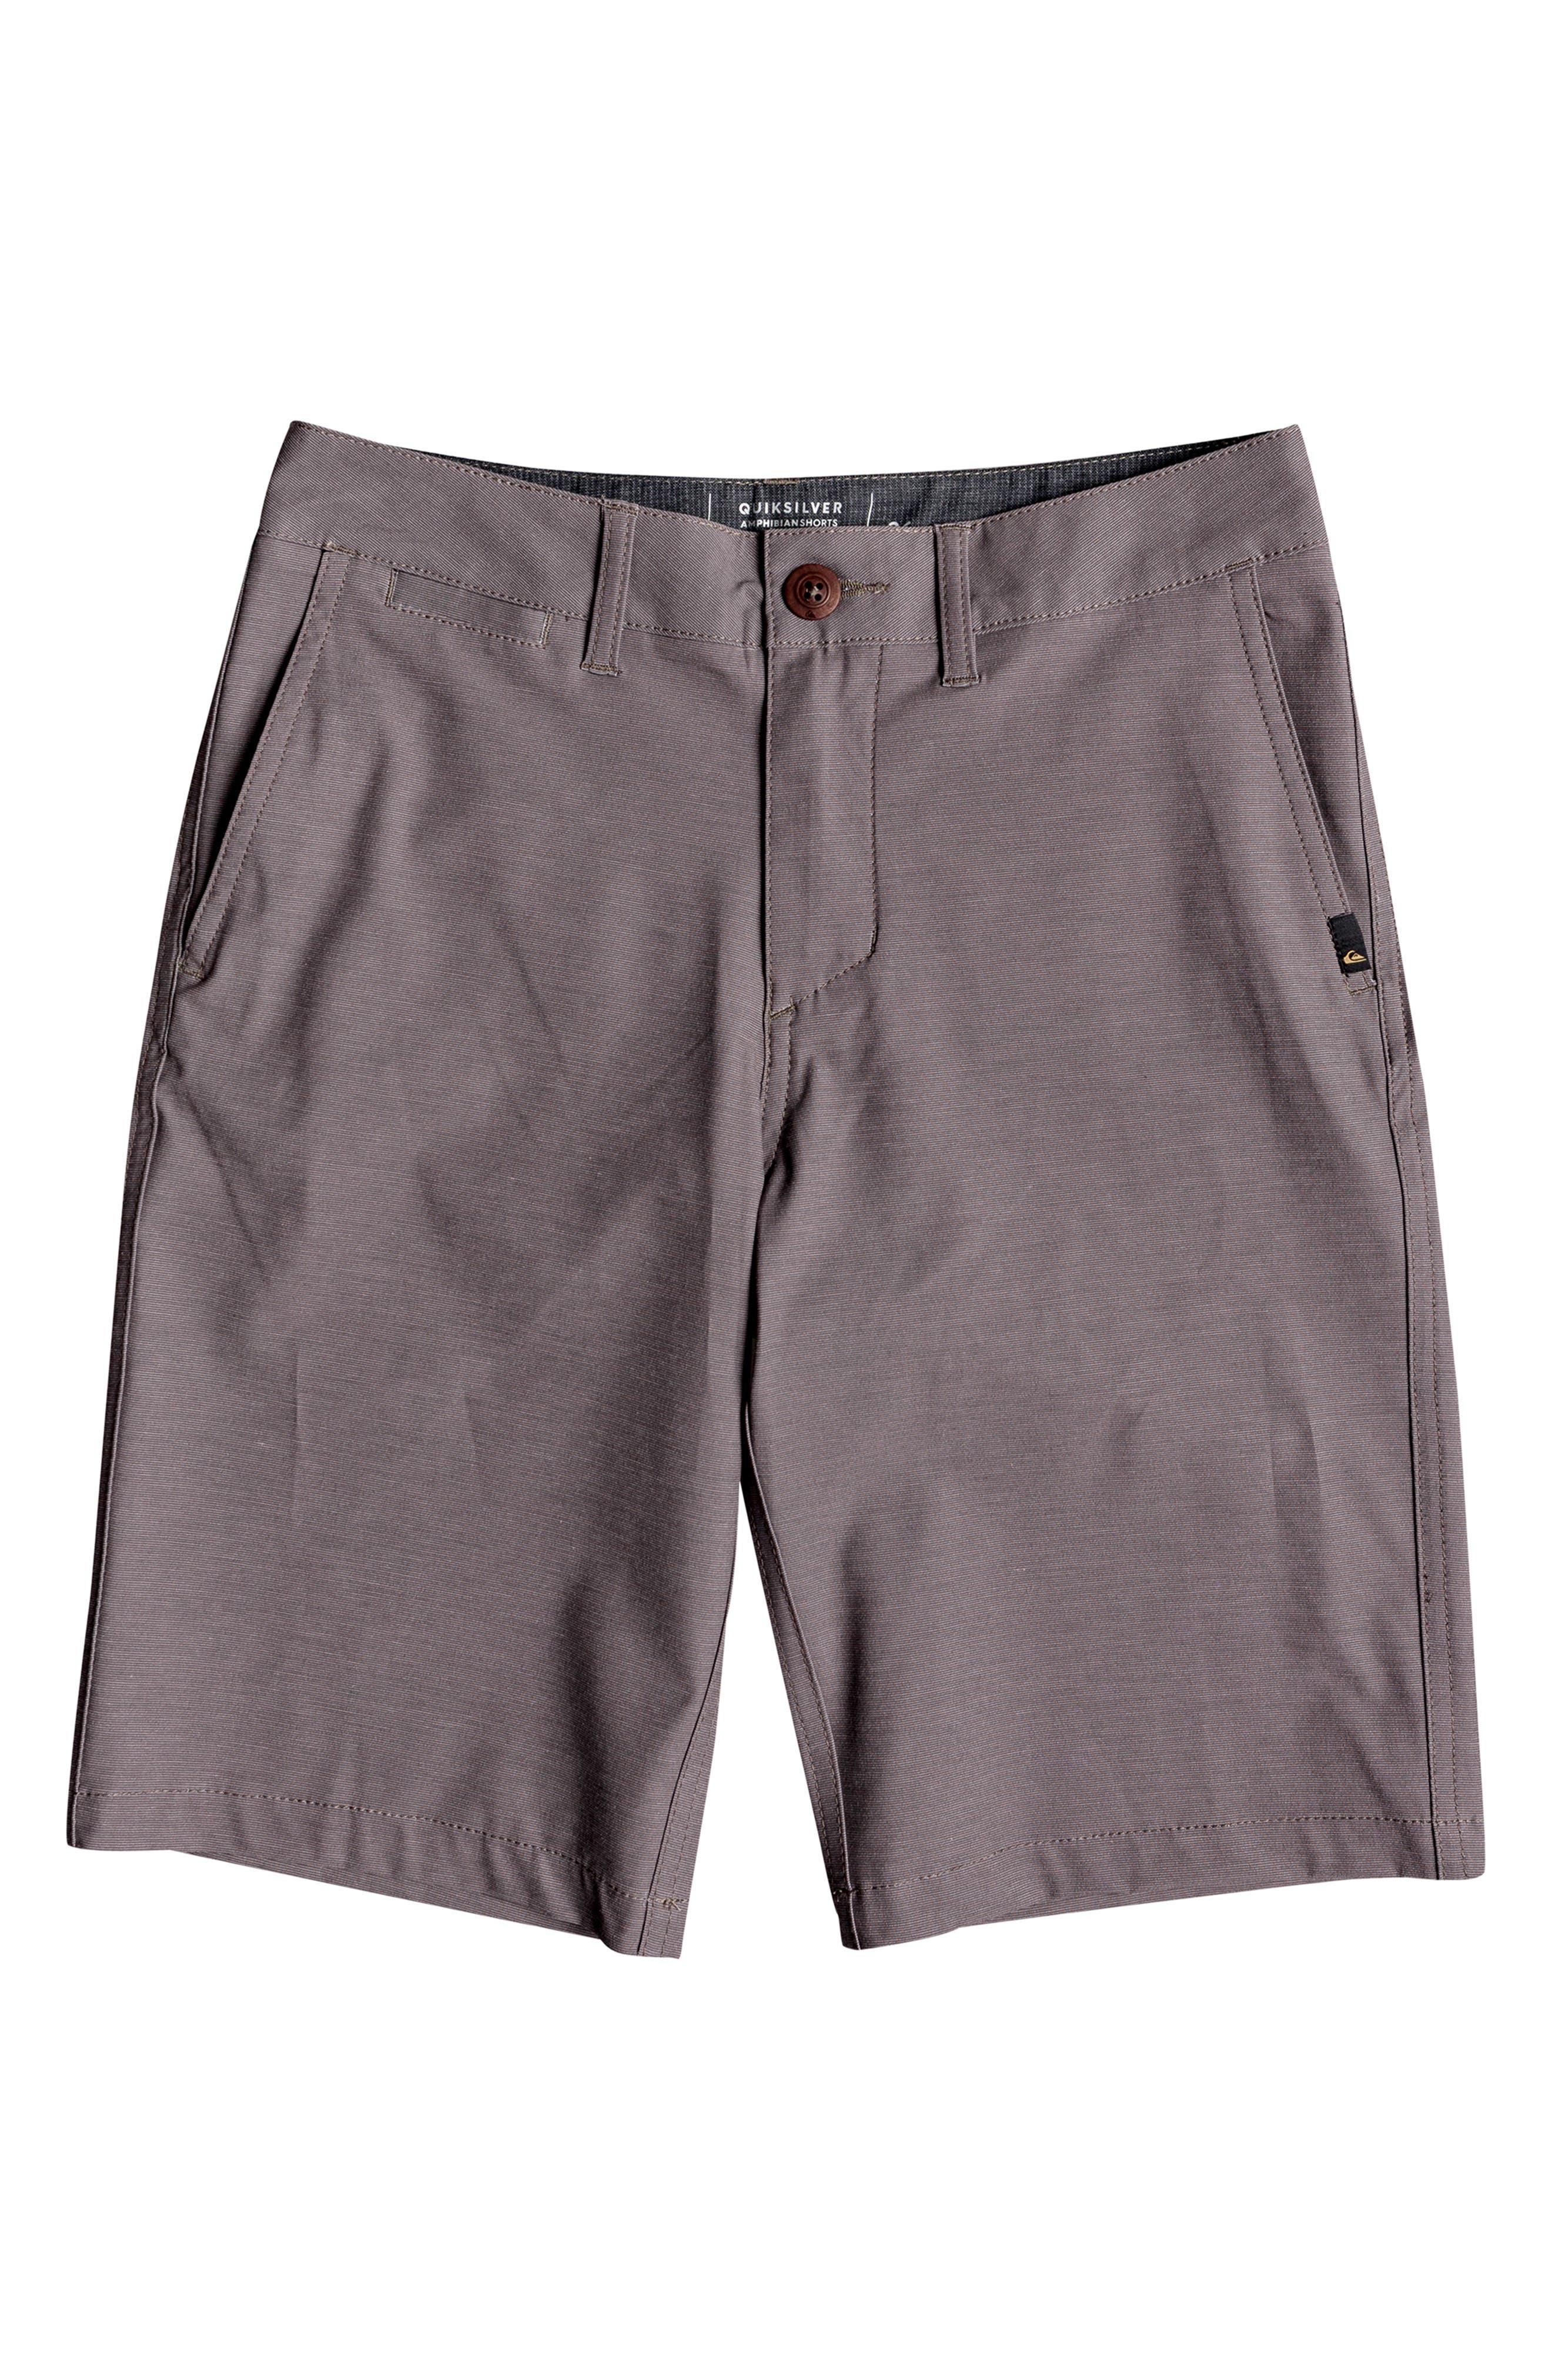 Union Heather Amphibian Hybrid Shorts,                         Main,                         color, FALCON